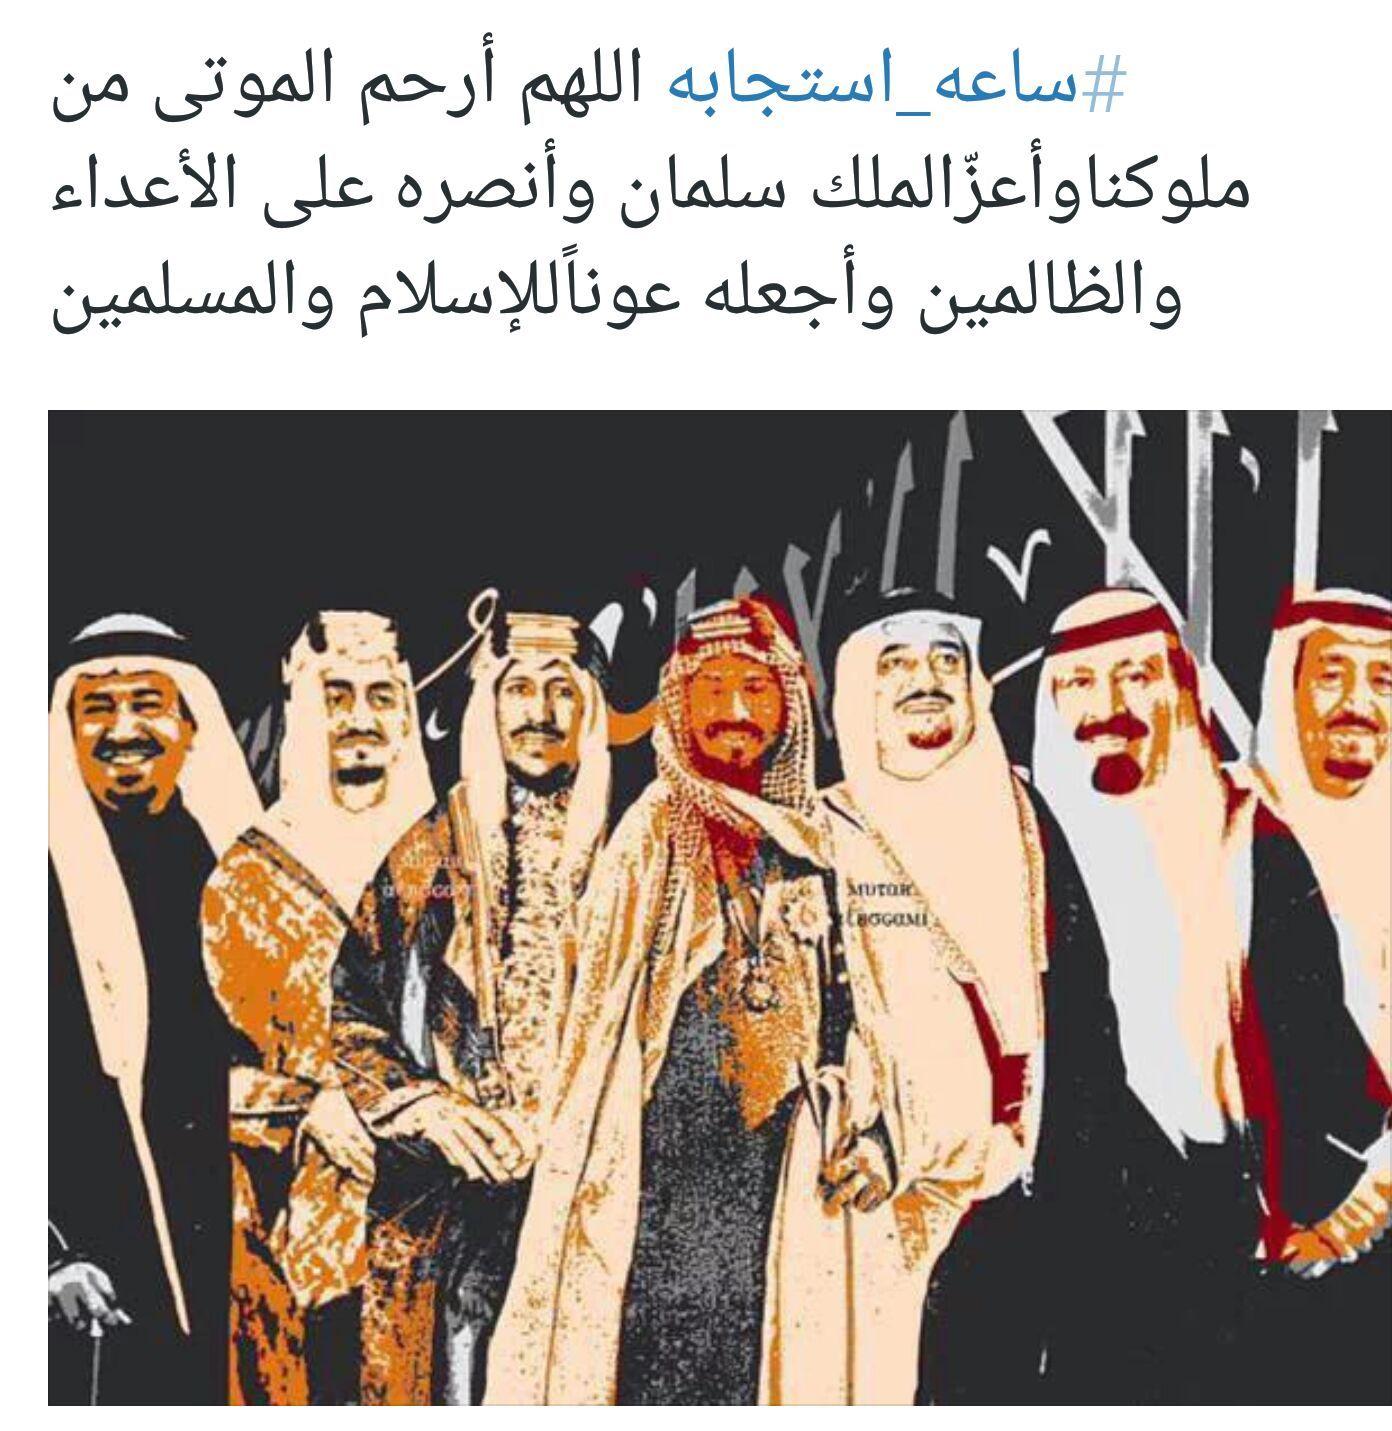 Pin By غيمه On المملكه العربيه السعوديه Saudi Arabia Comic Book Cover Drawings